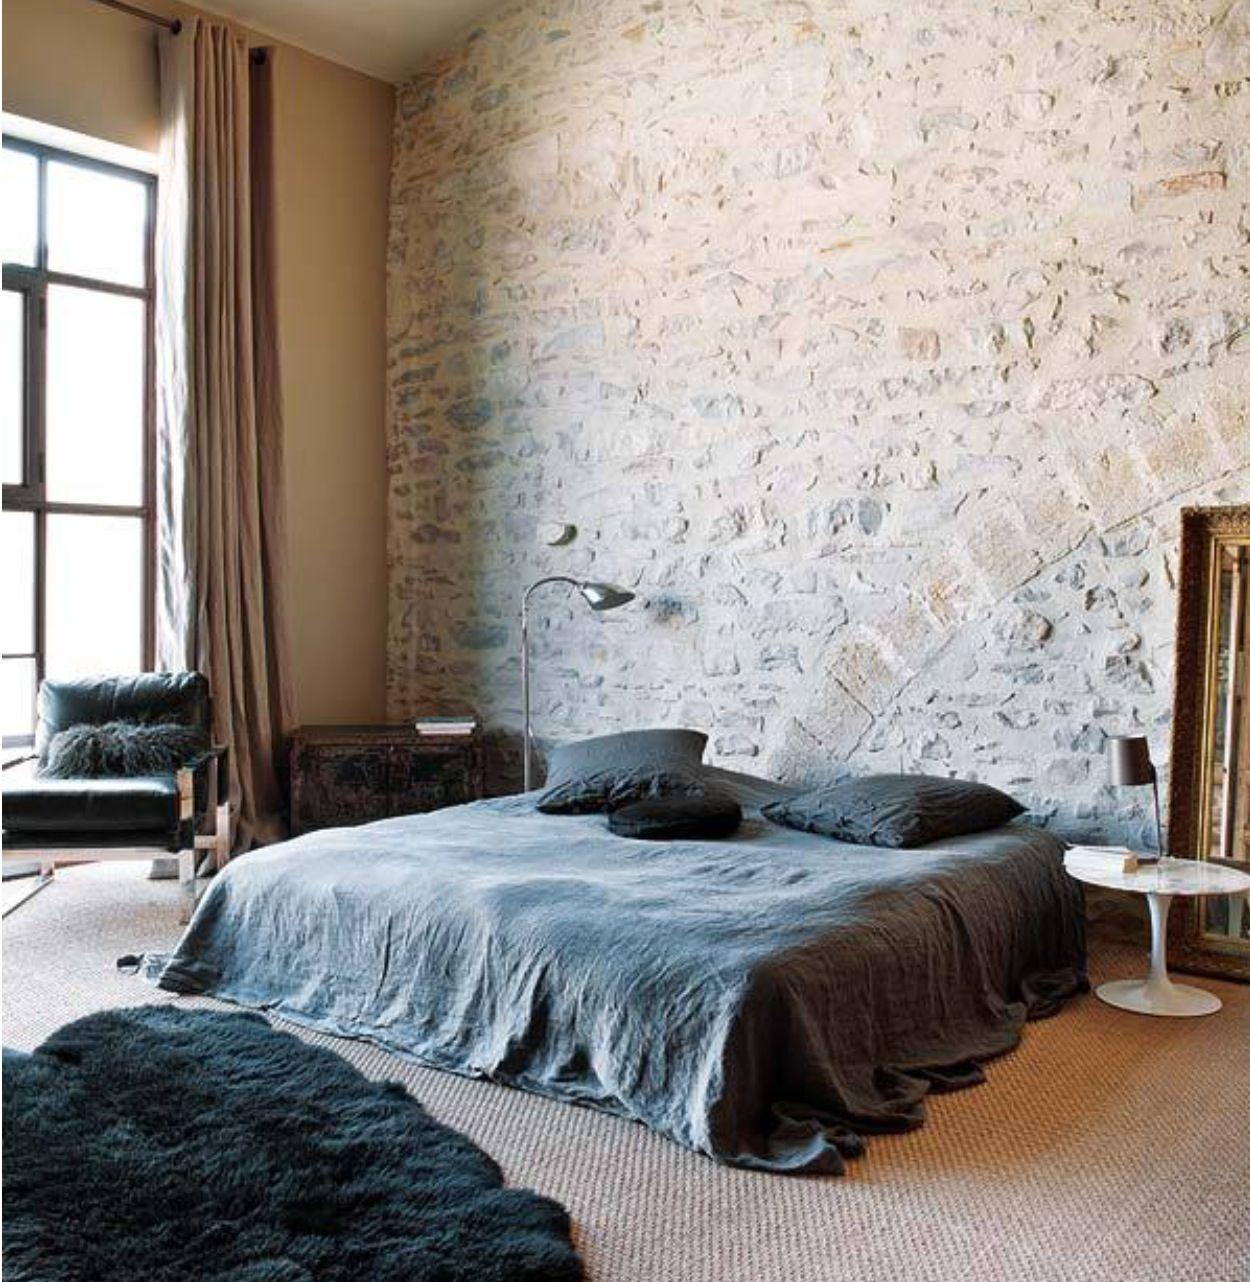 Modern Stone Walled Rustic Bedroom Scheme